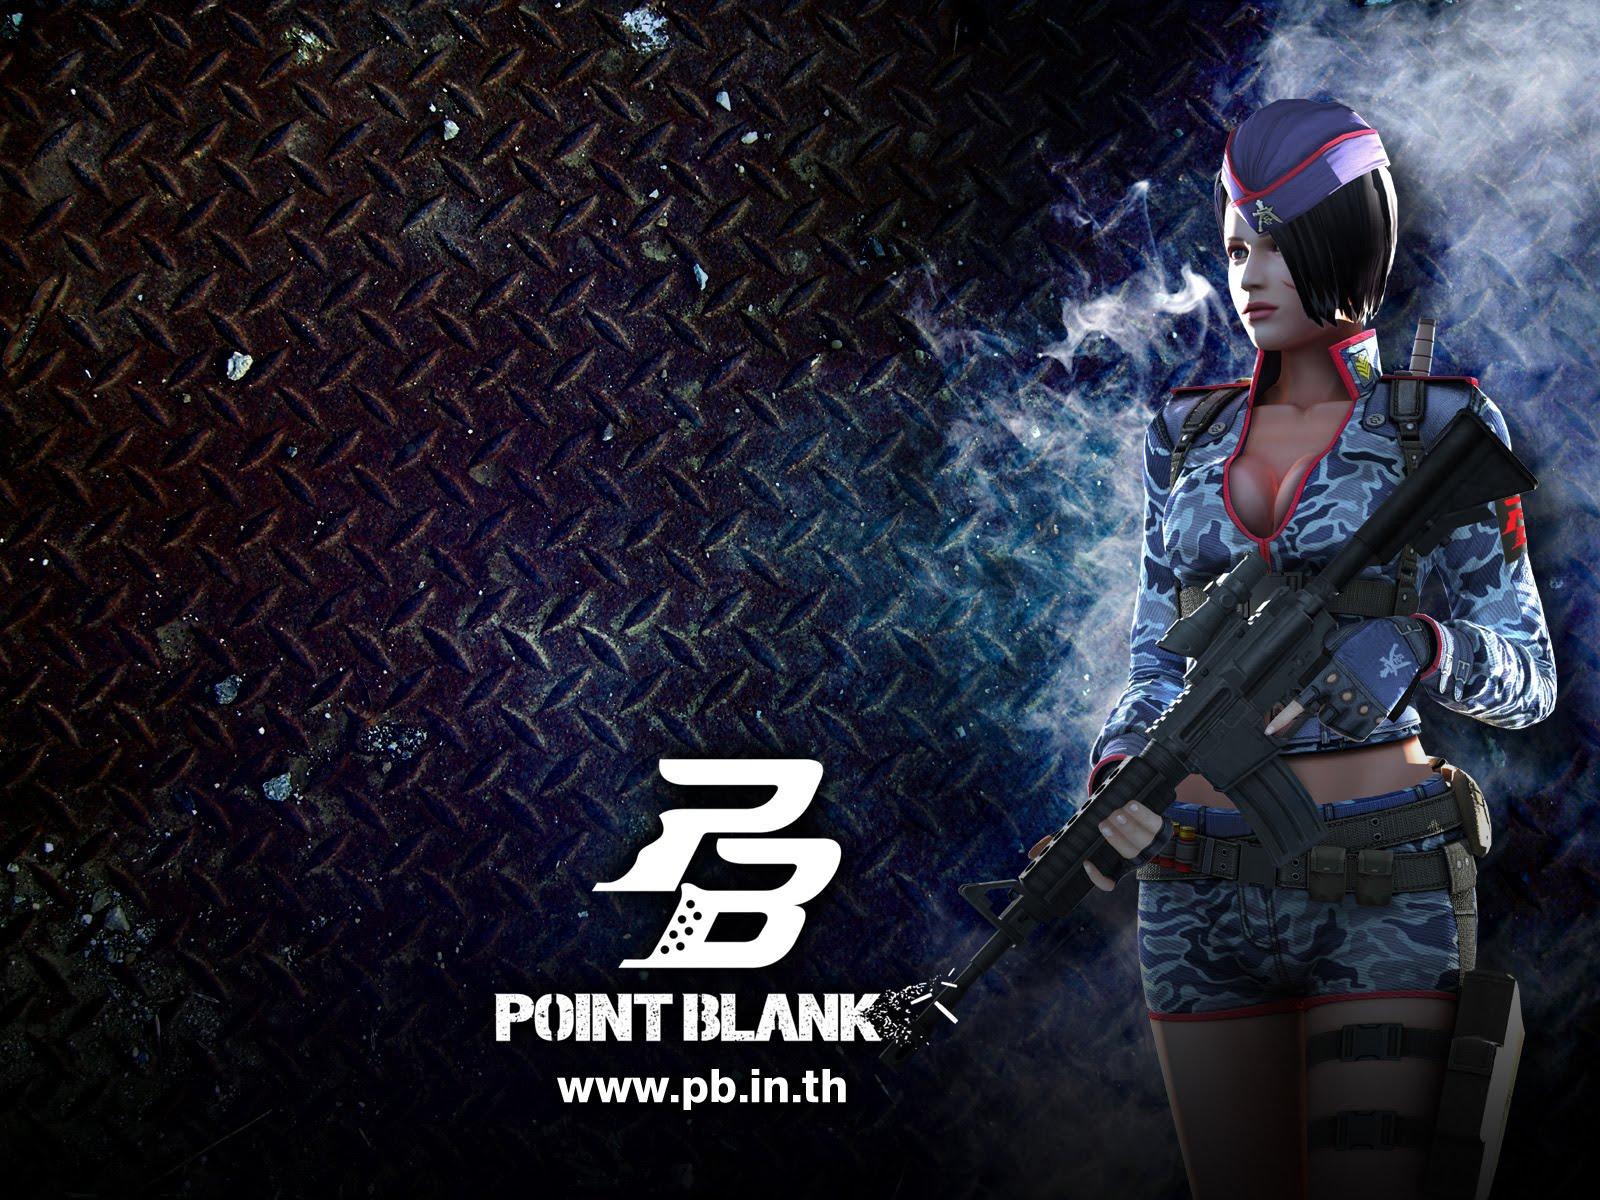 PB - Point Blank Wallpaper Creative poster HD   Zeromin0